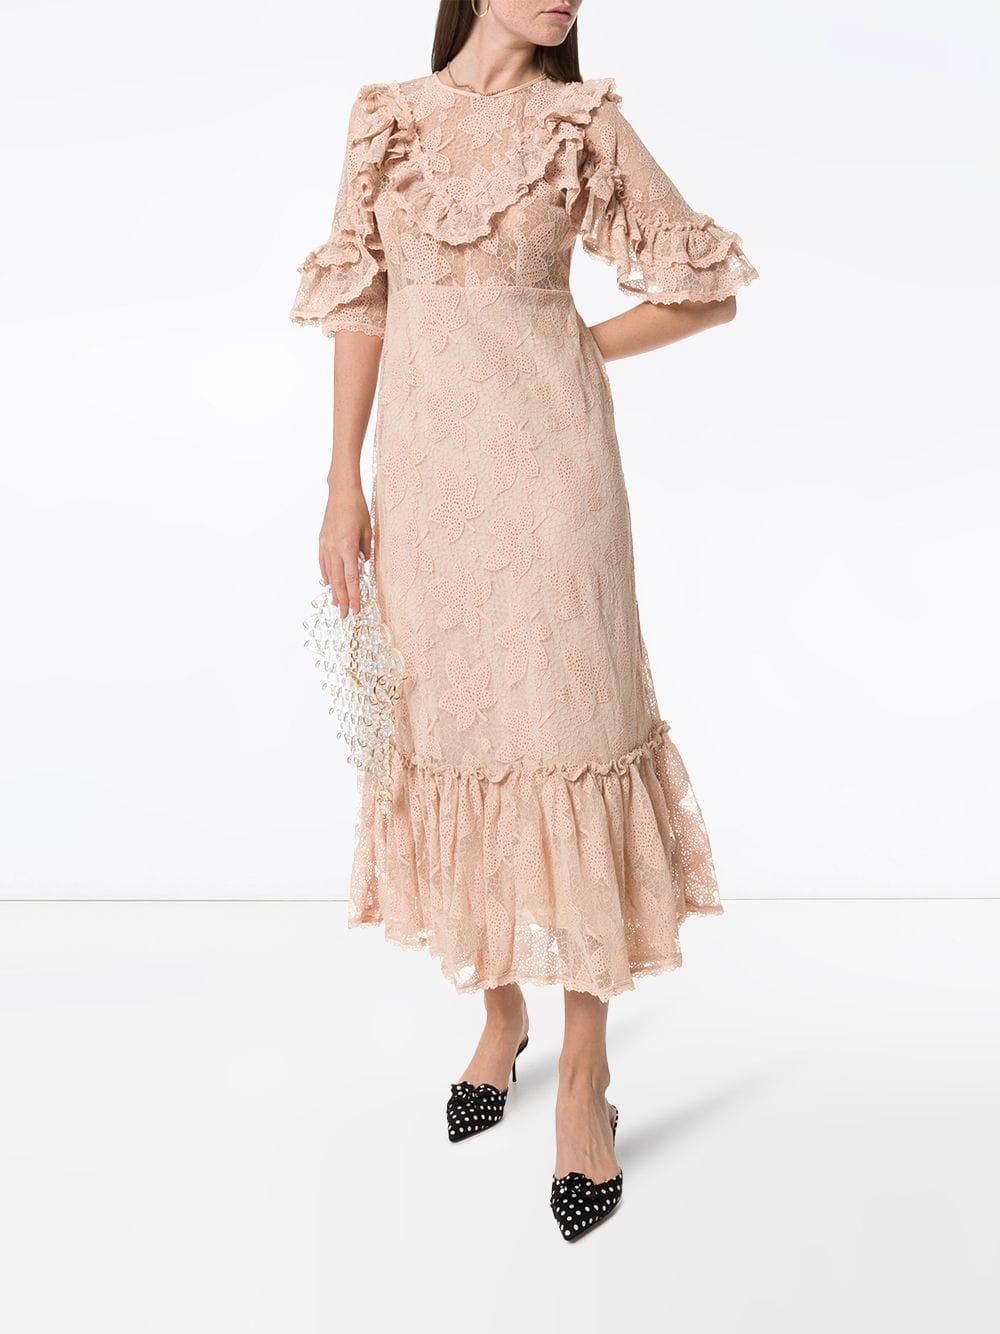 BYTIMO Ruffled Lace Midi Dress